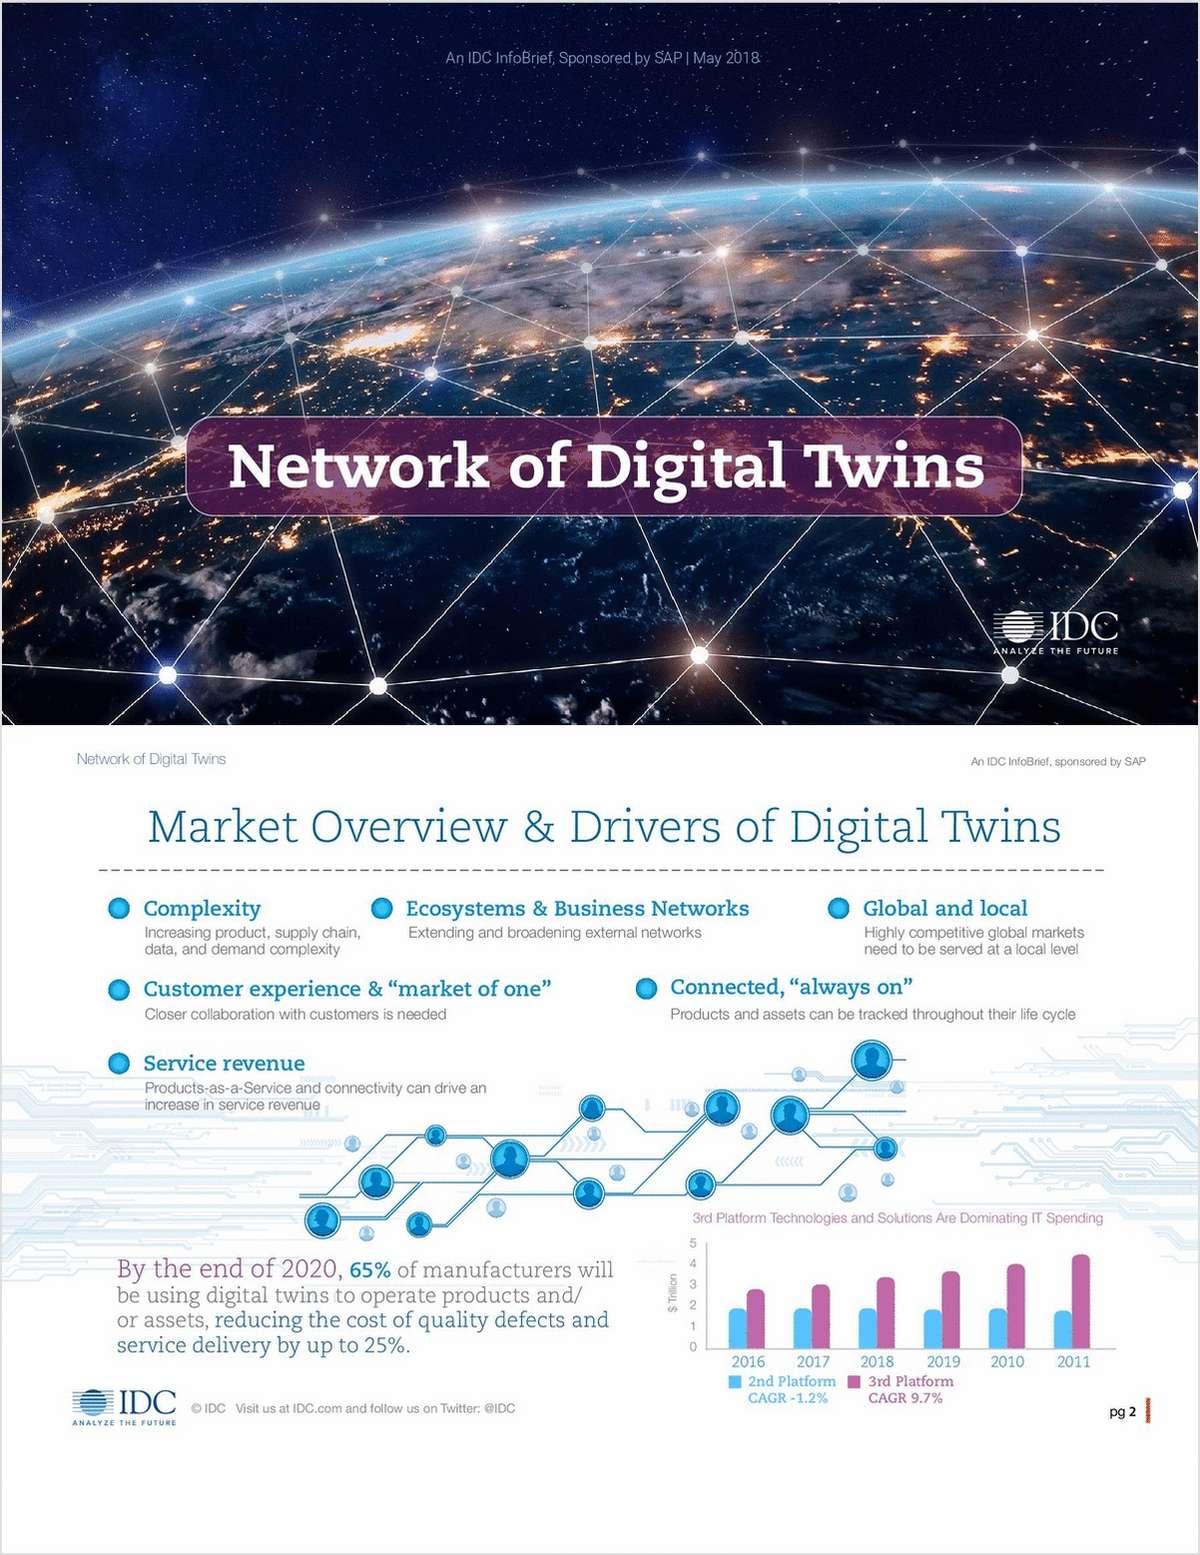 Network of Digital Twins